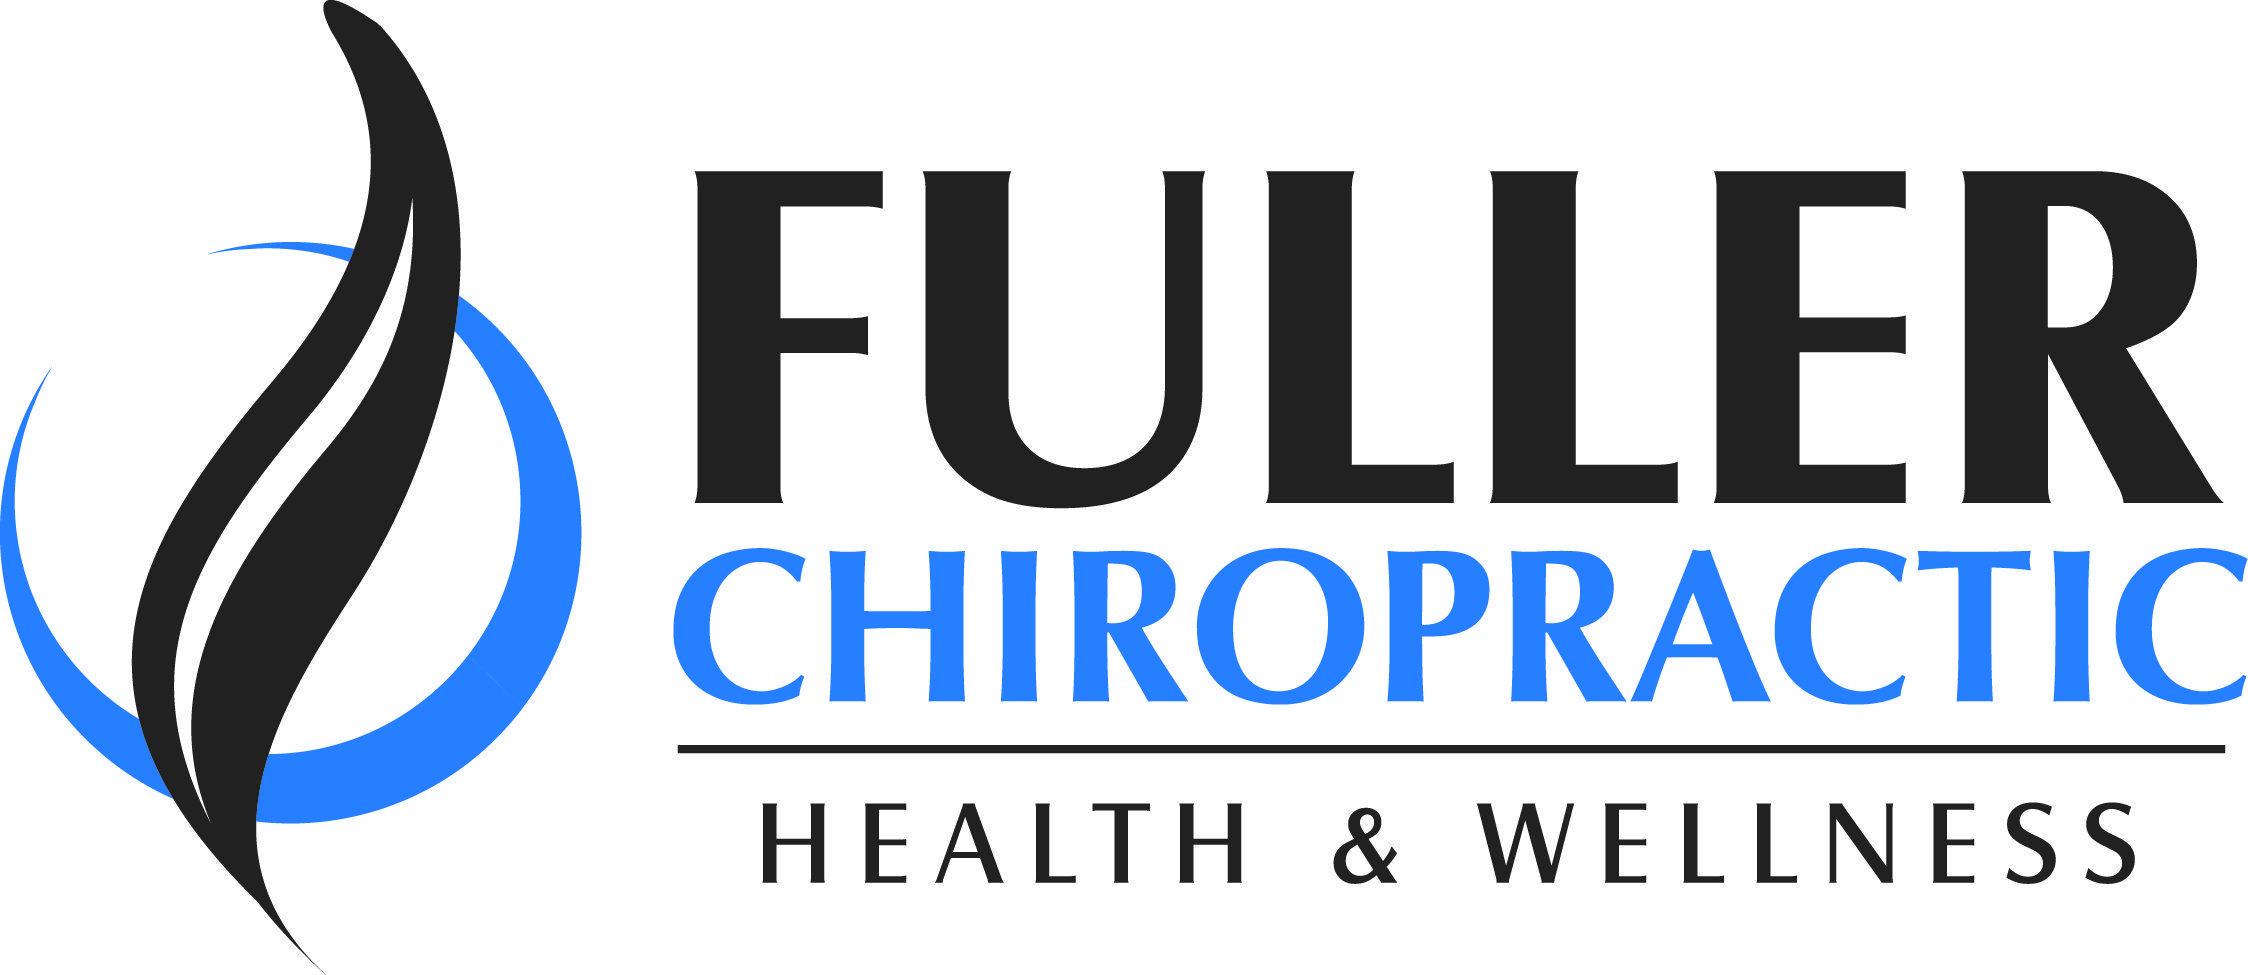 Fuller Chiropractic Clinic